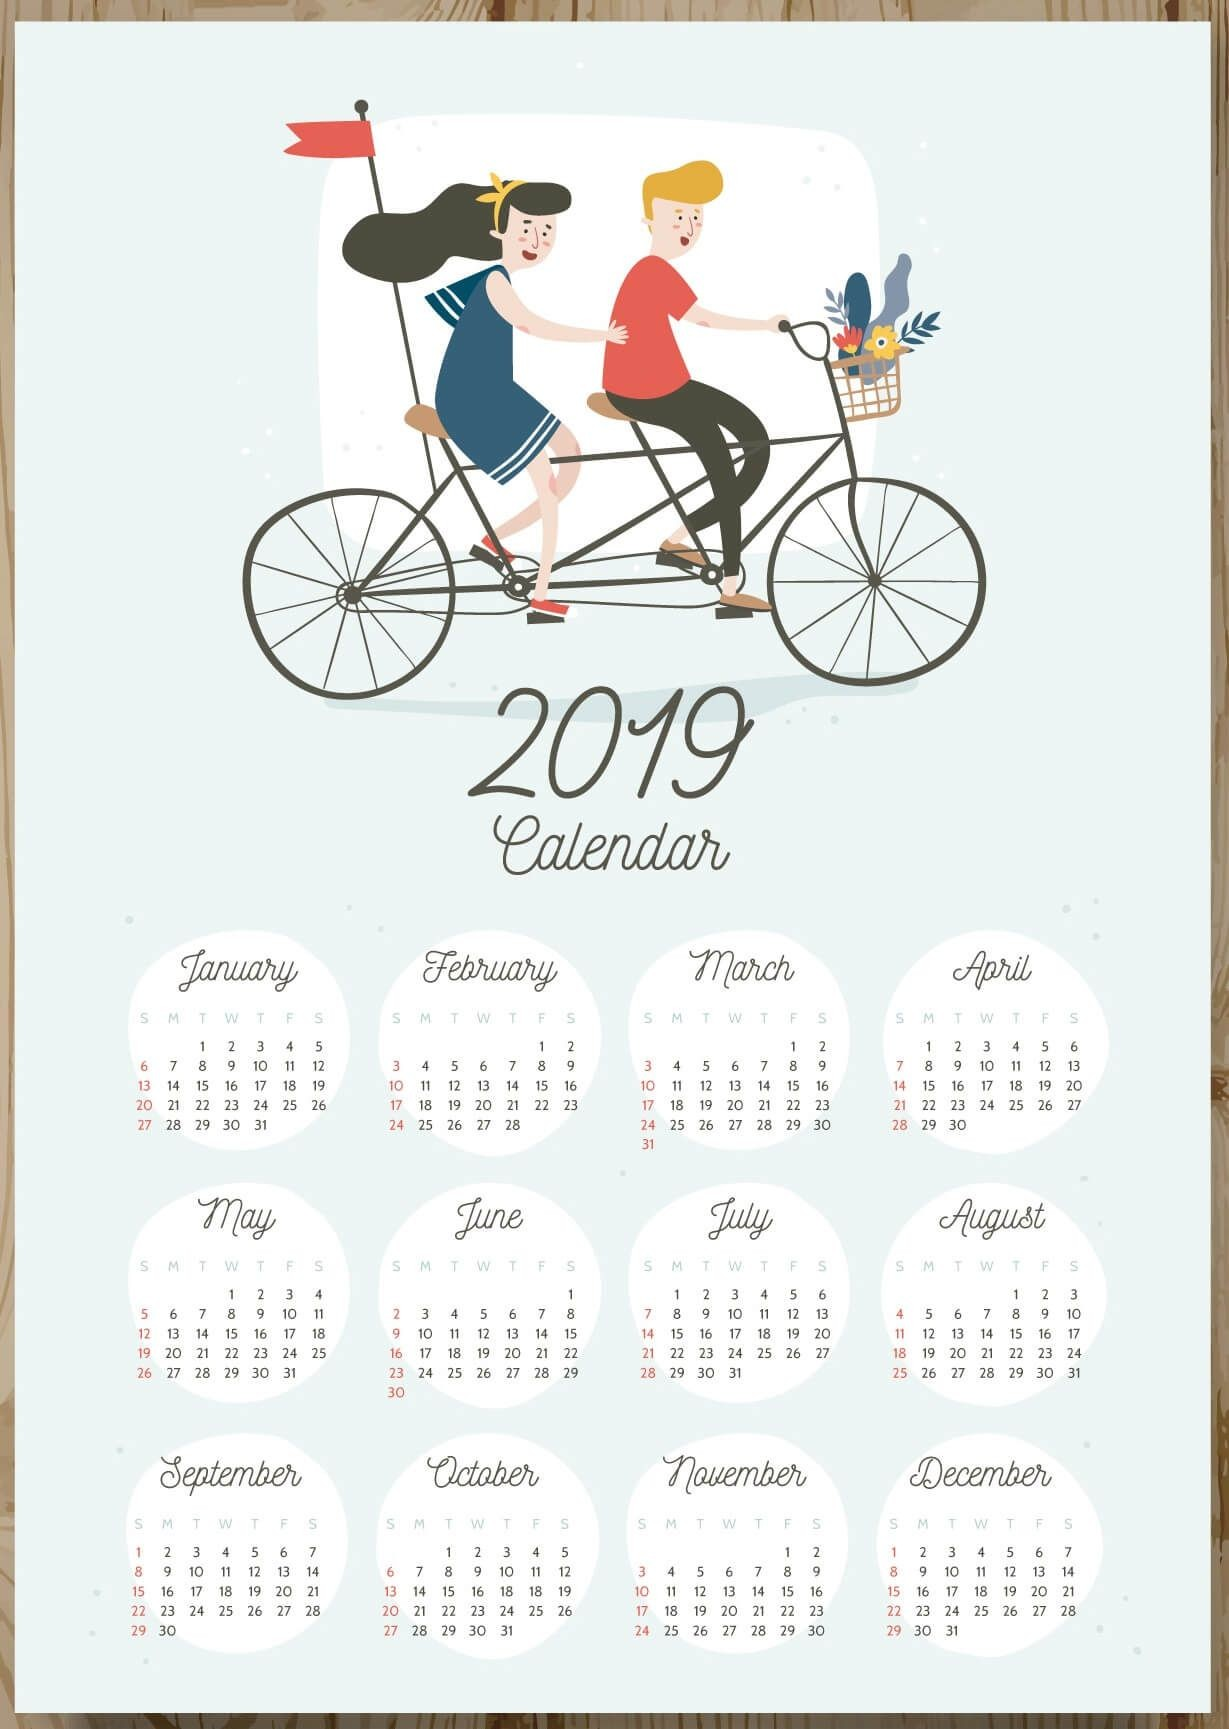 Calendario 2019 Para Imprimir Con Fotos Recientes 12 Months 2019 E Page Calendar 2019calendars Of Calendario 2019 Para Imprimir Con Fotos Más Populares De Lujo 51 Ejemplos Festivos 2019